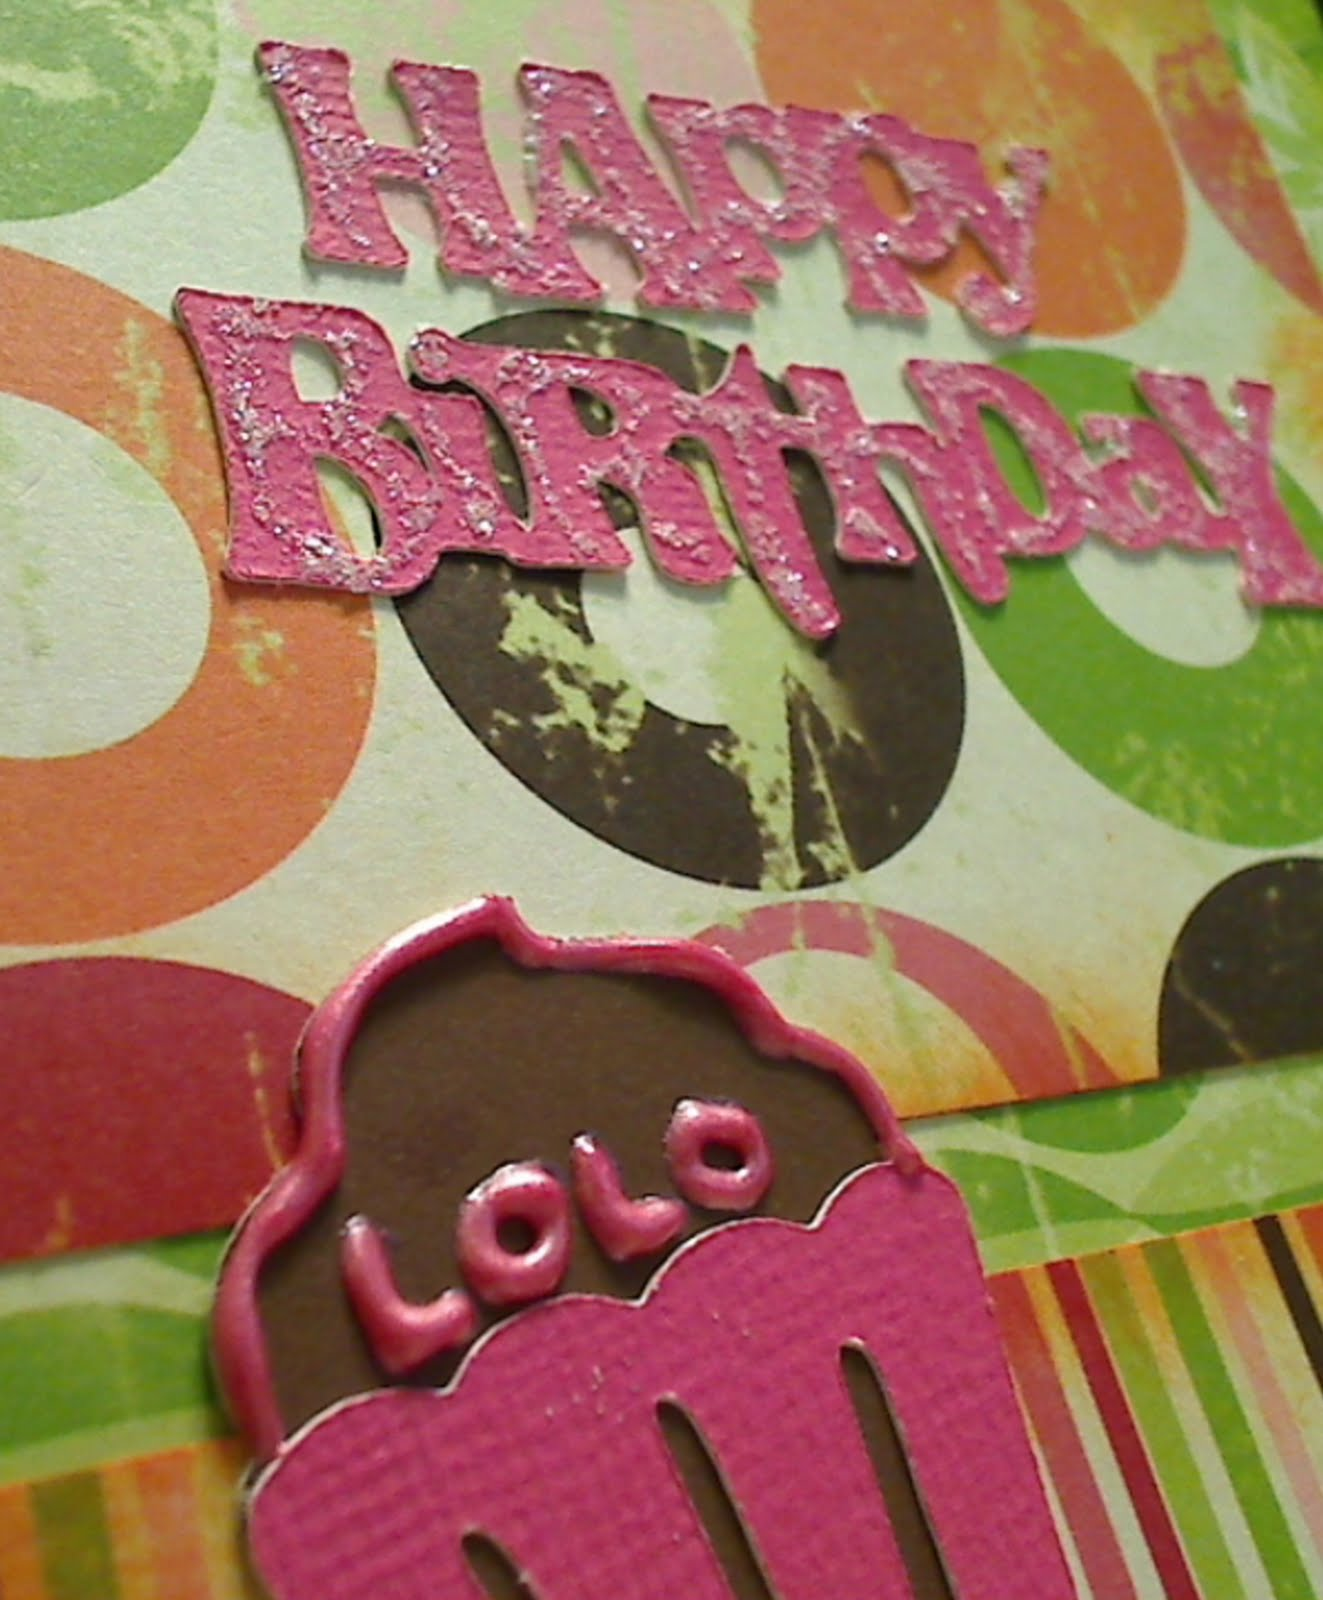 Lolo S Cakes Sweets: Scrap Addict's Attic: Happy Birthday Lolo